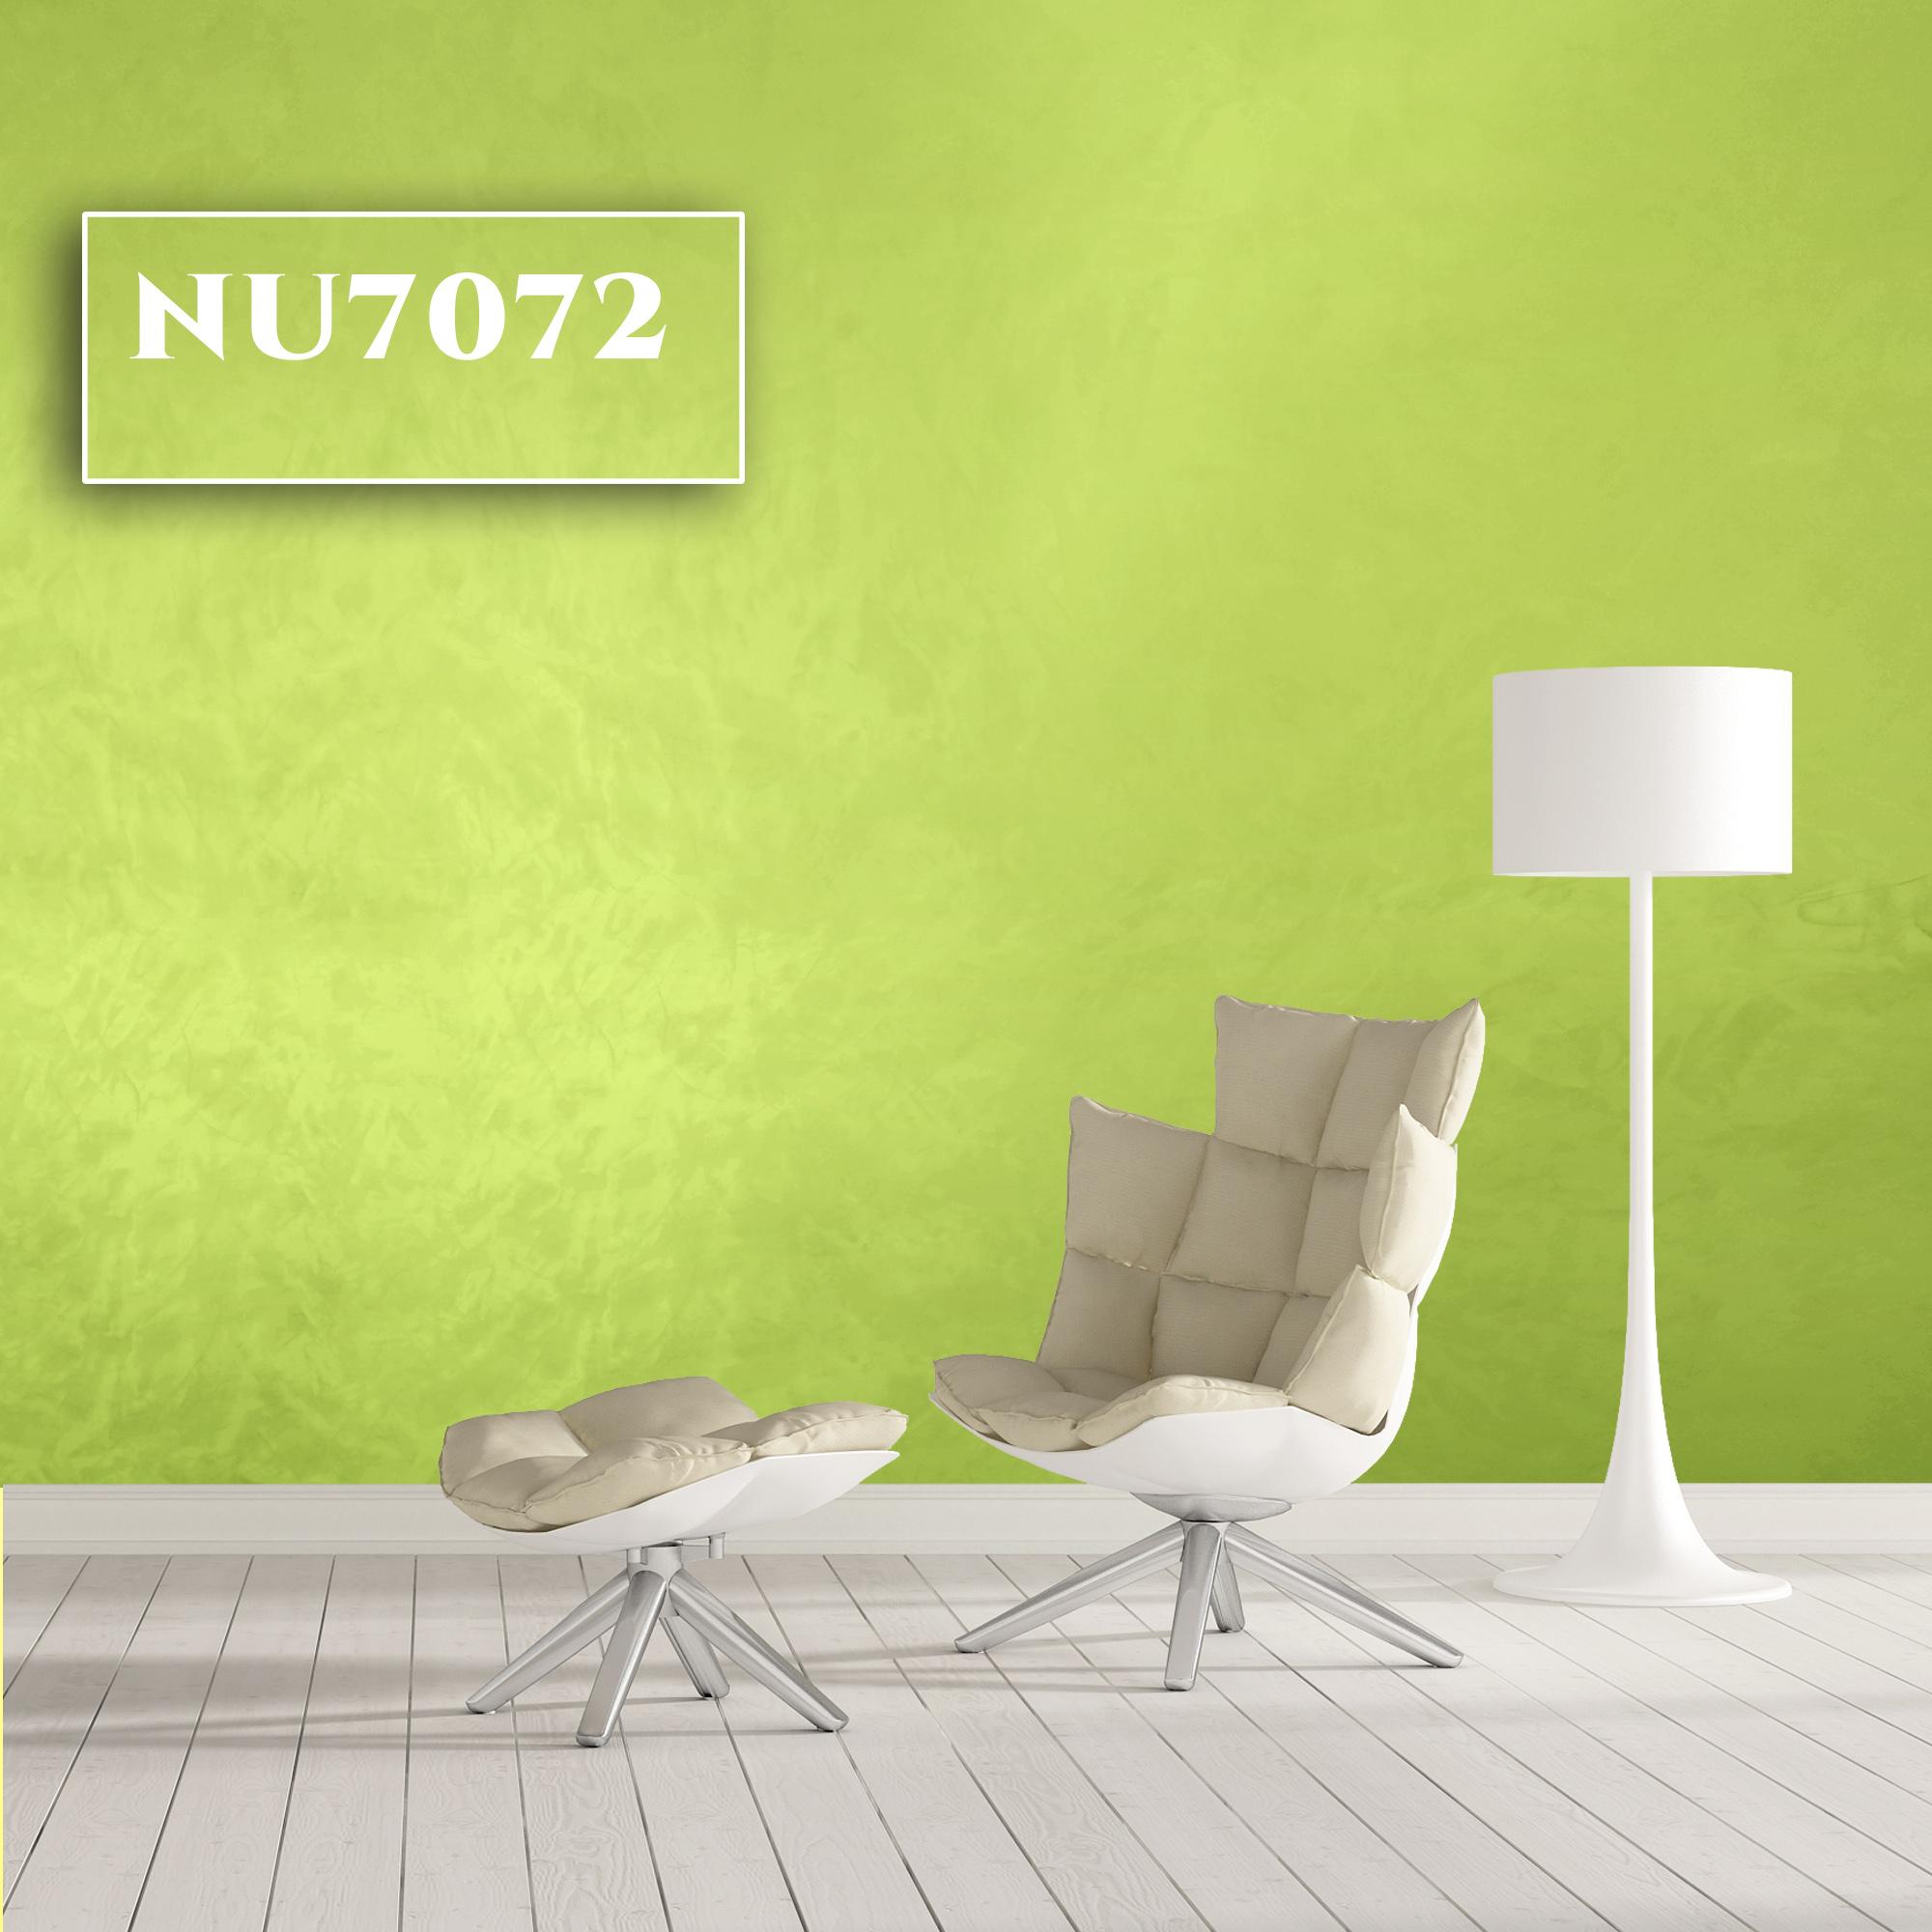 NU7072-1